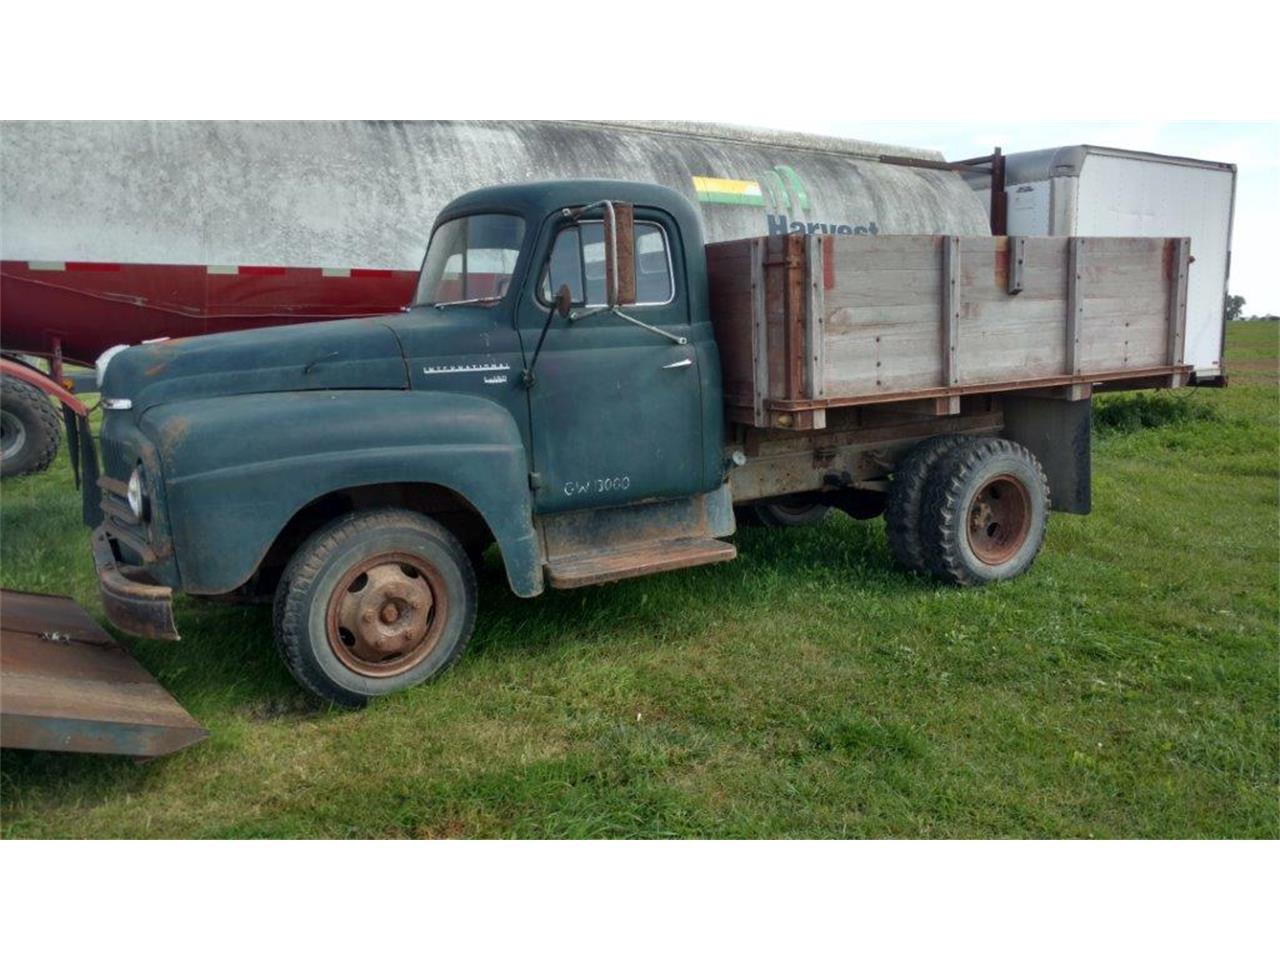 For Sale: 1952 International Pickup in Parkers Prairie, Minnesota